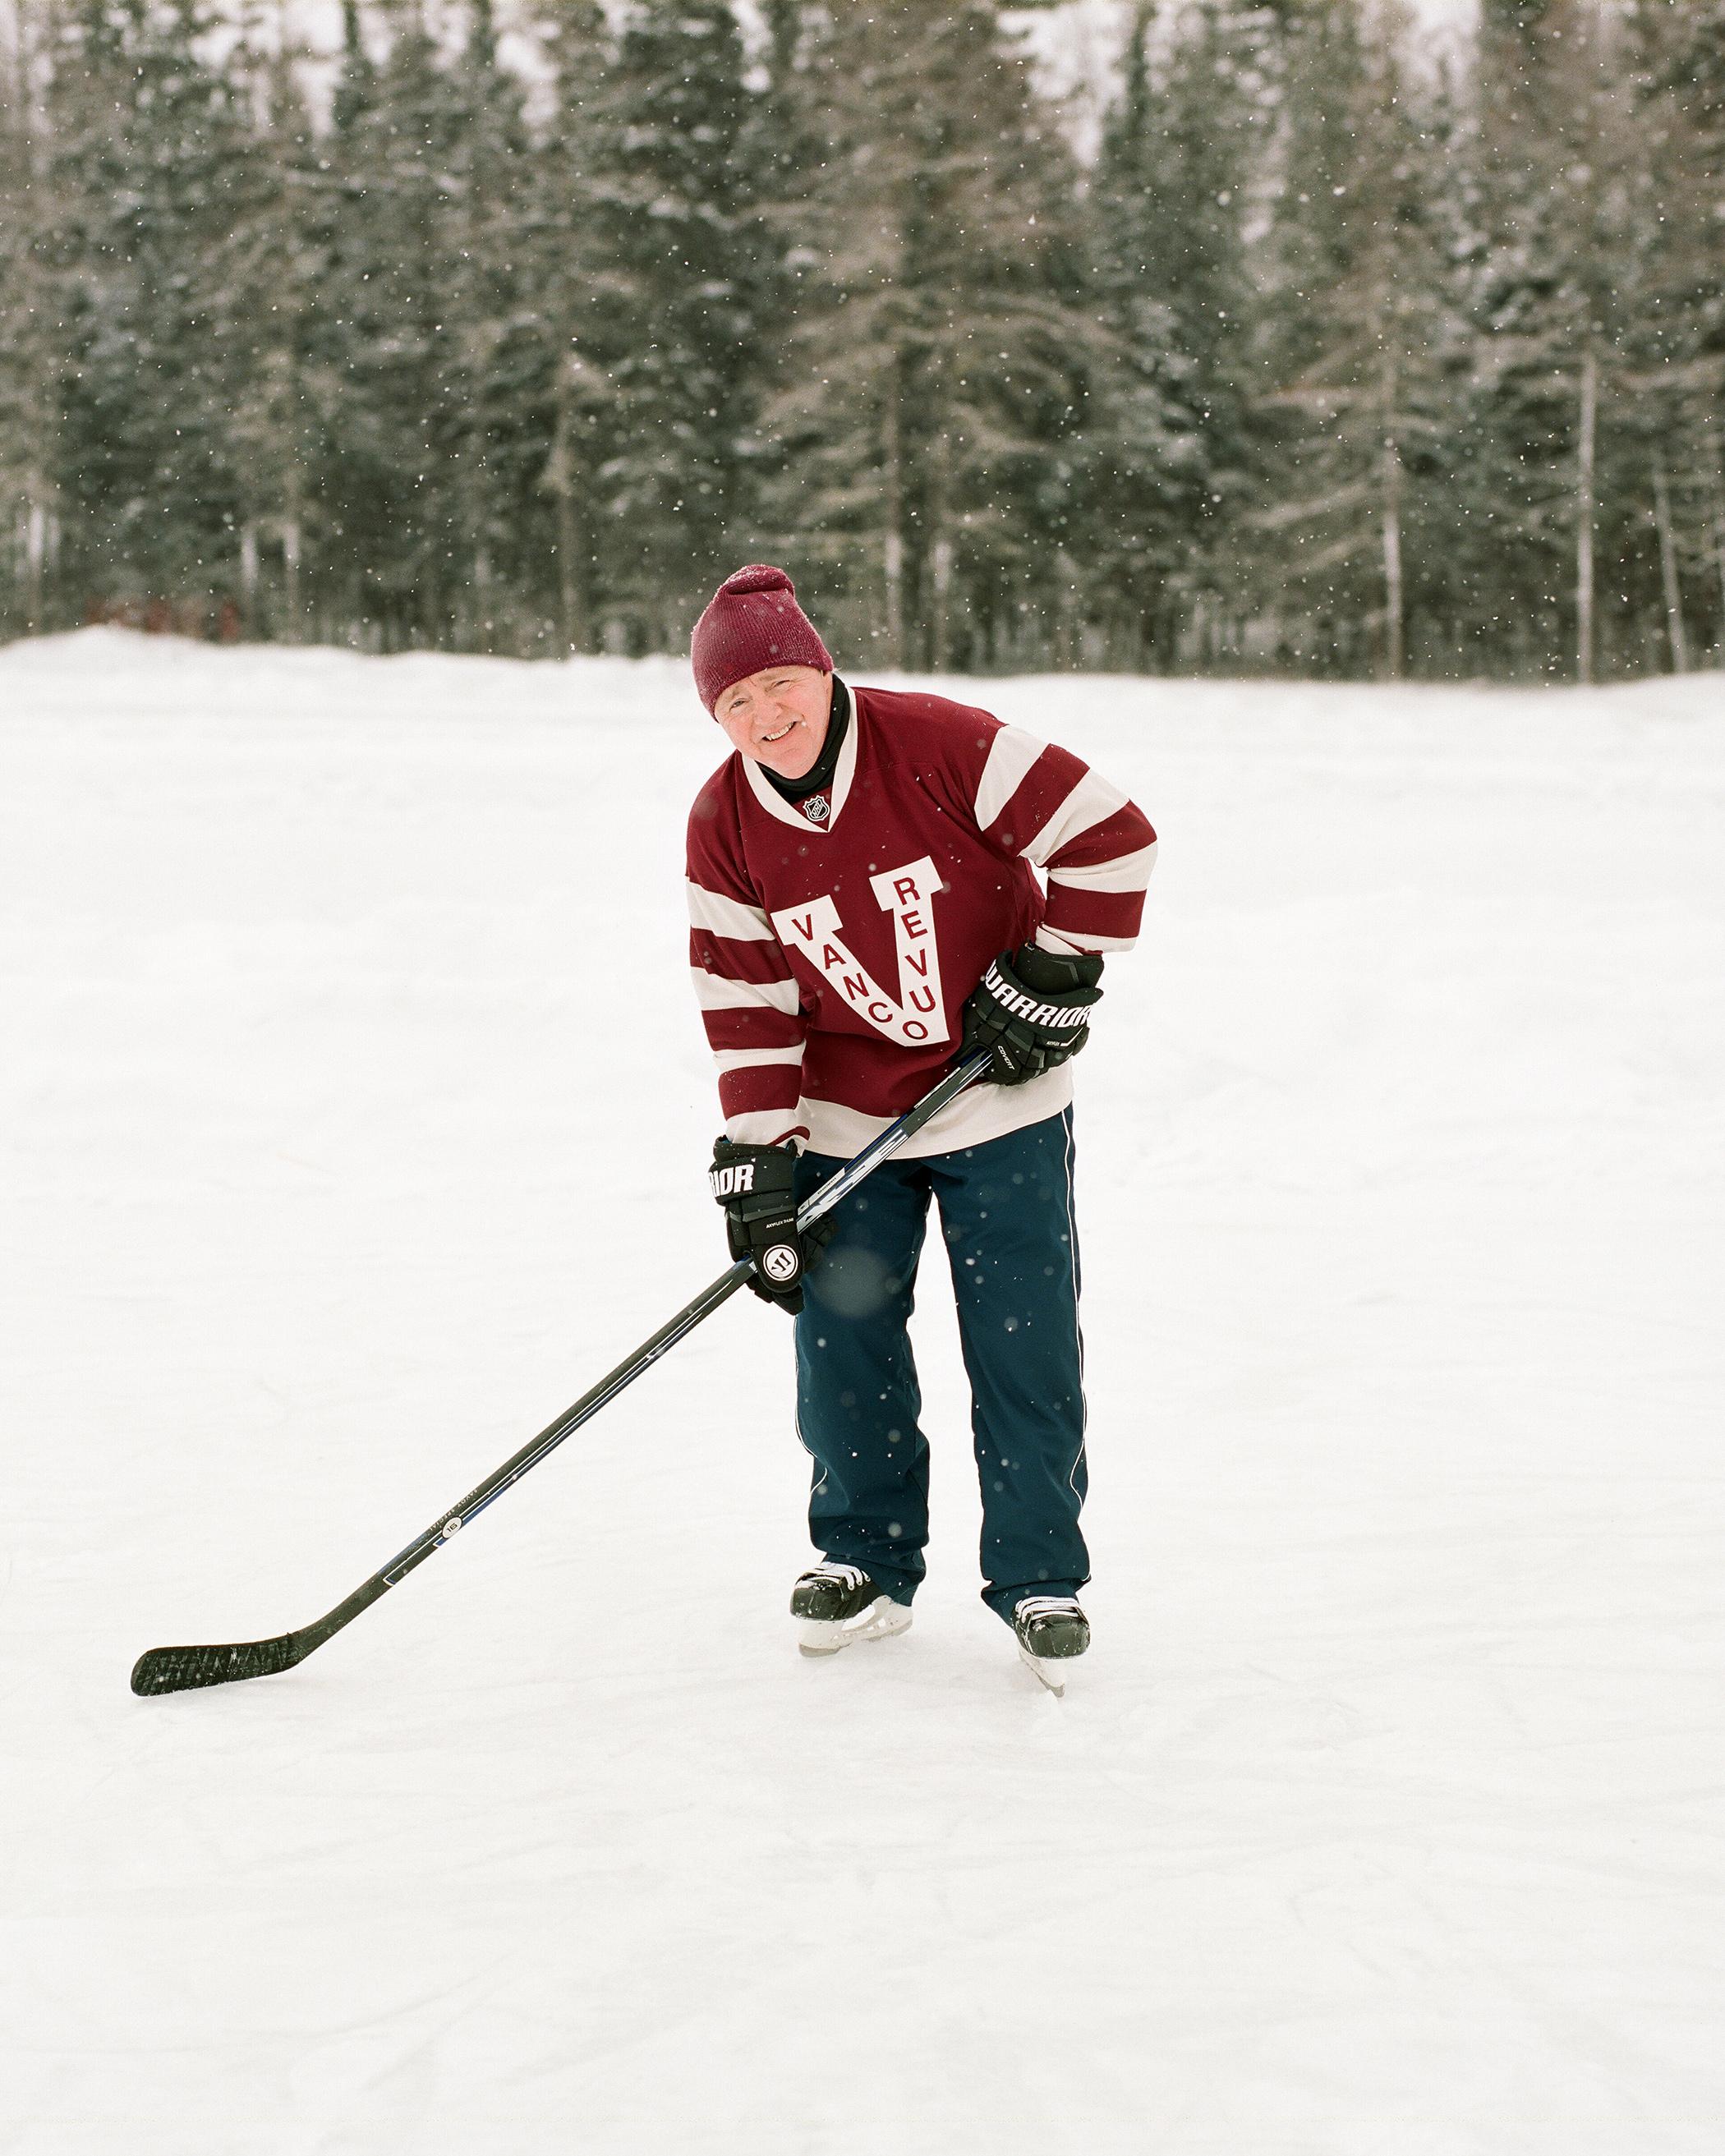 205.EnRoute-PondHockeyFilm_707.jpg